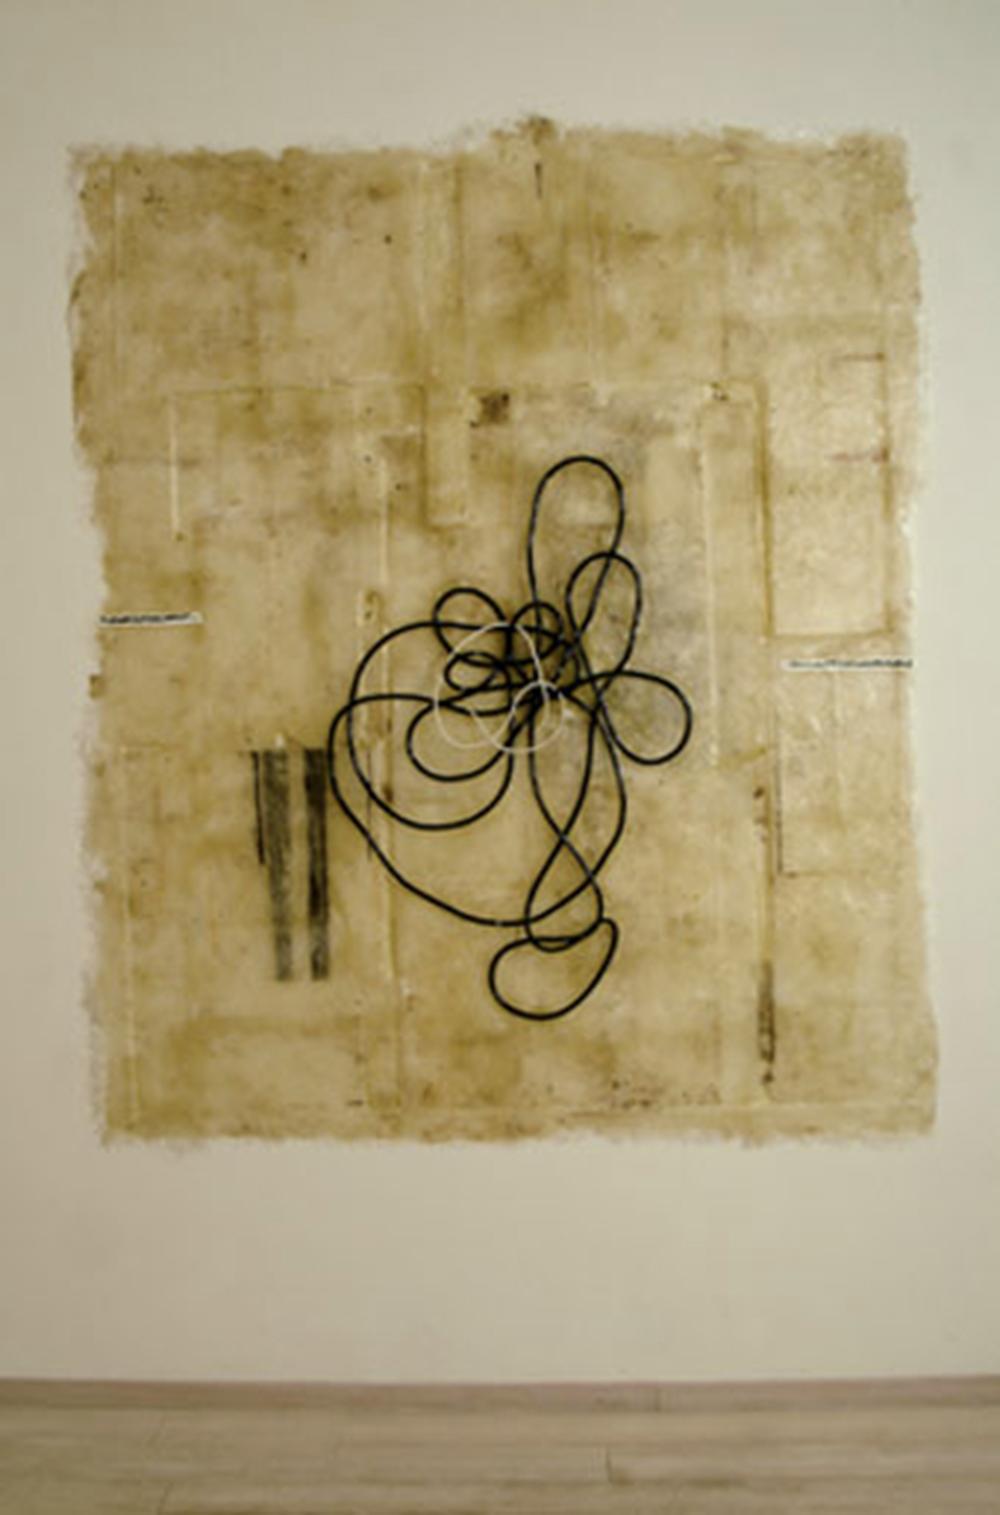 Grande nodo, 2005, gomma, corda e olio su vetroresina, cm 260x220